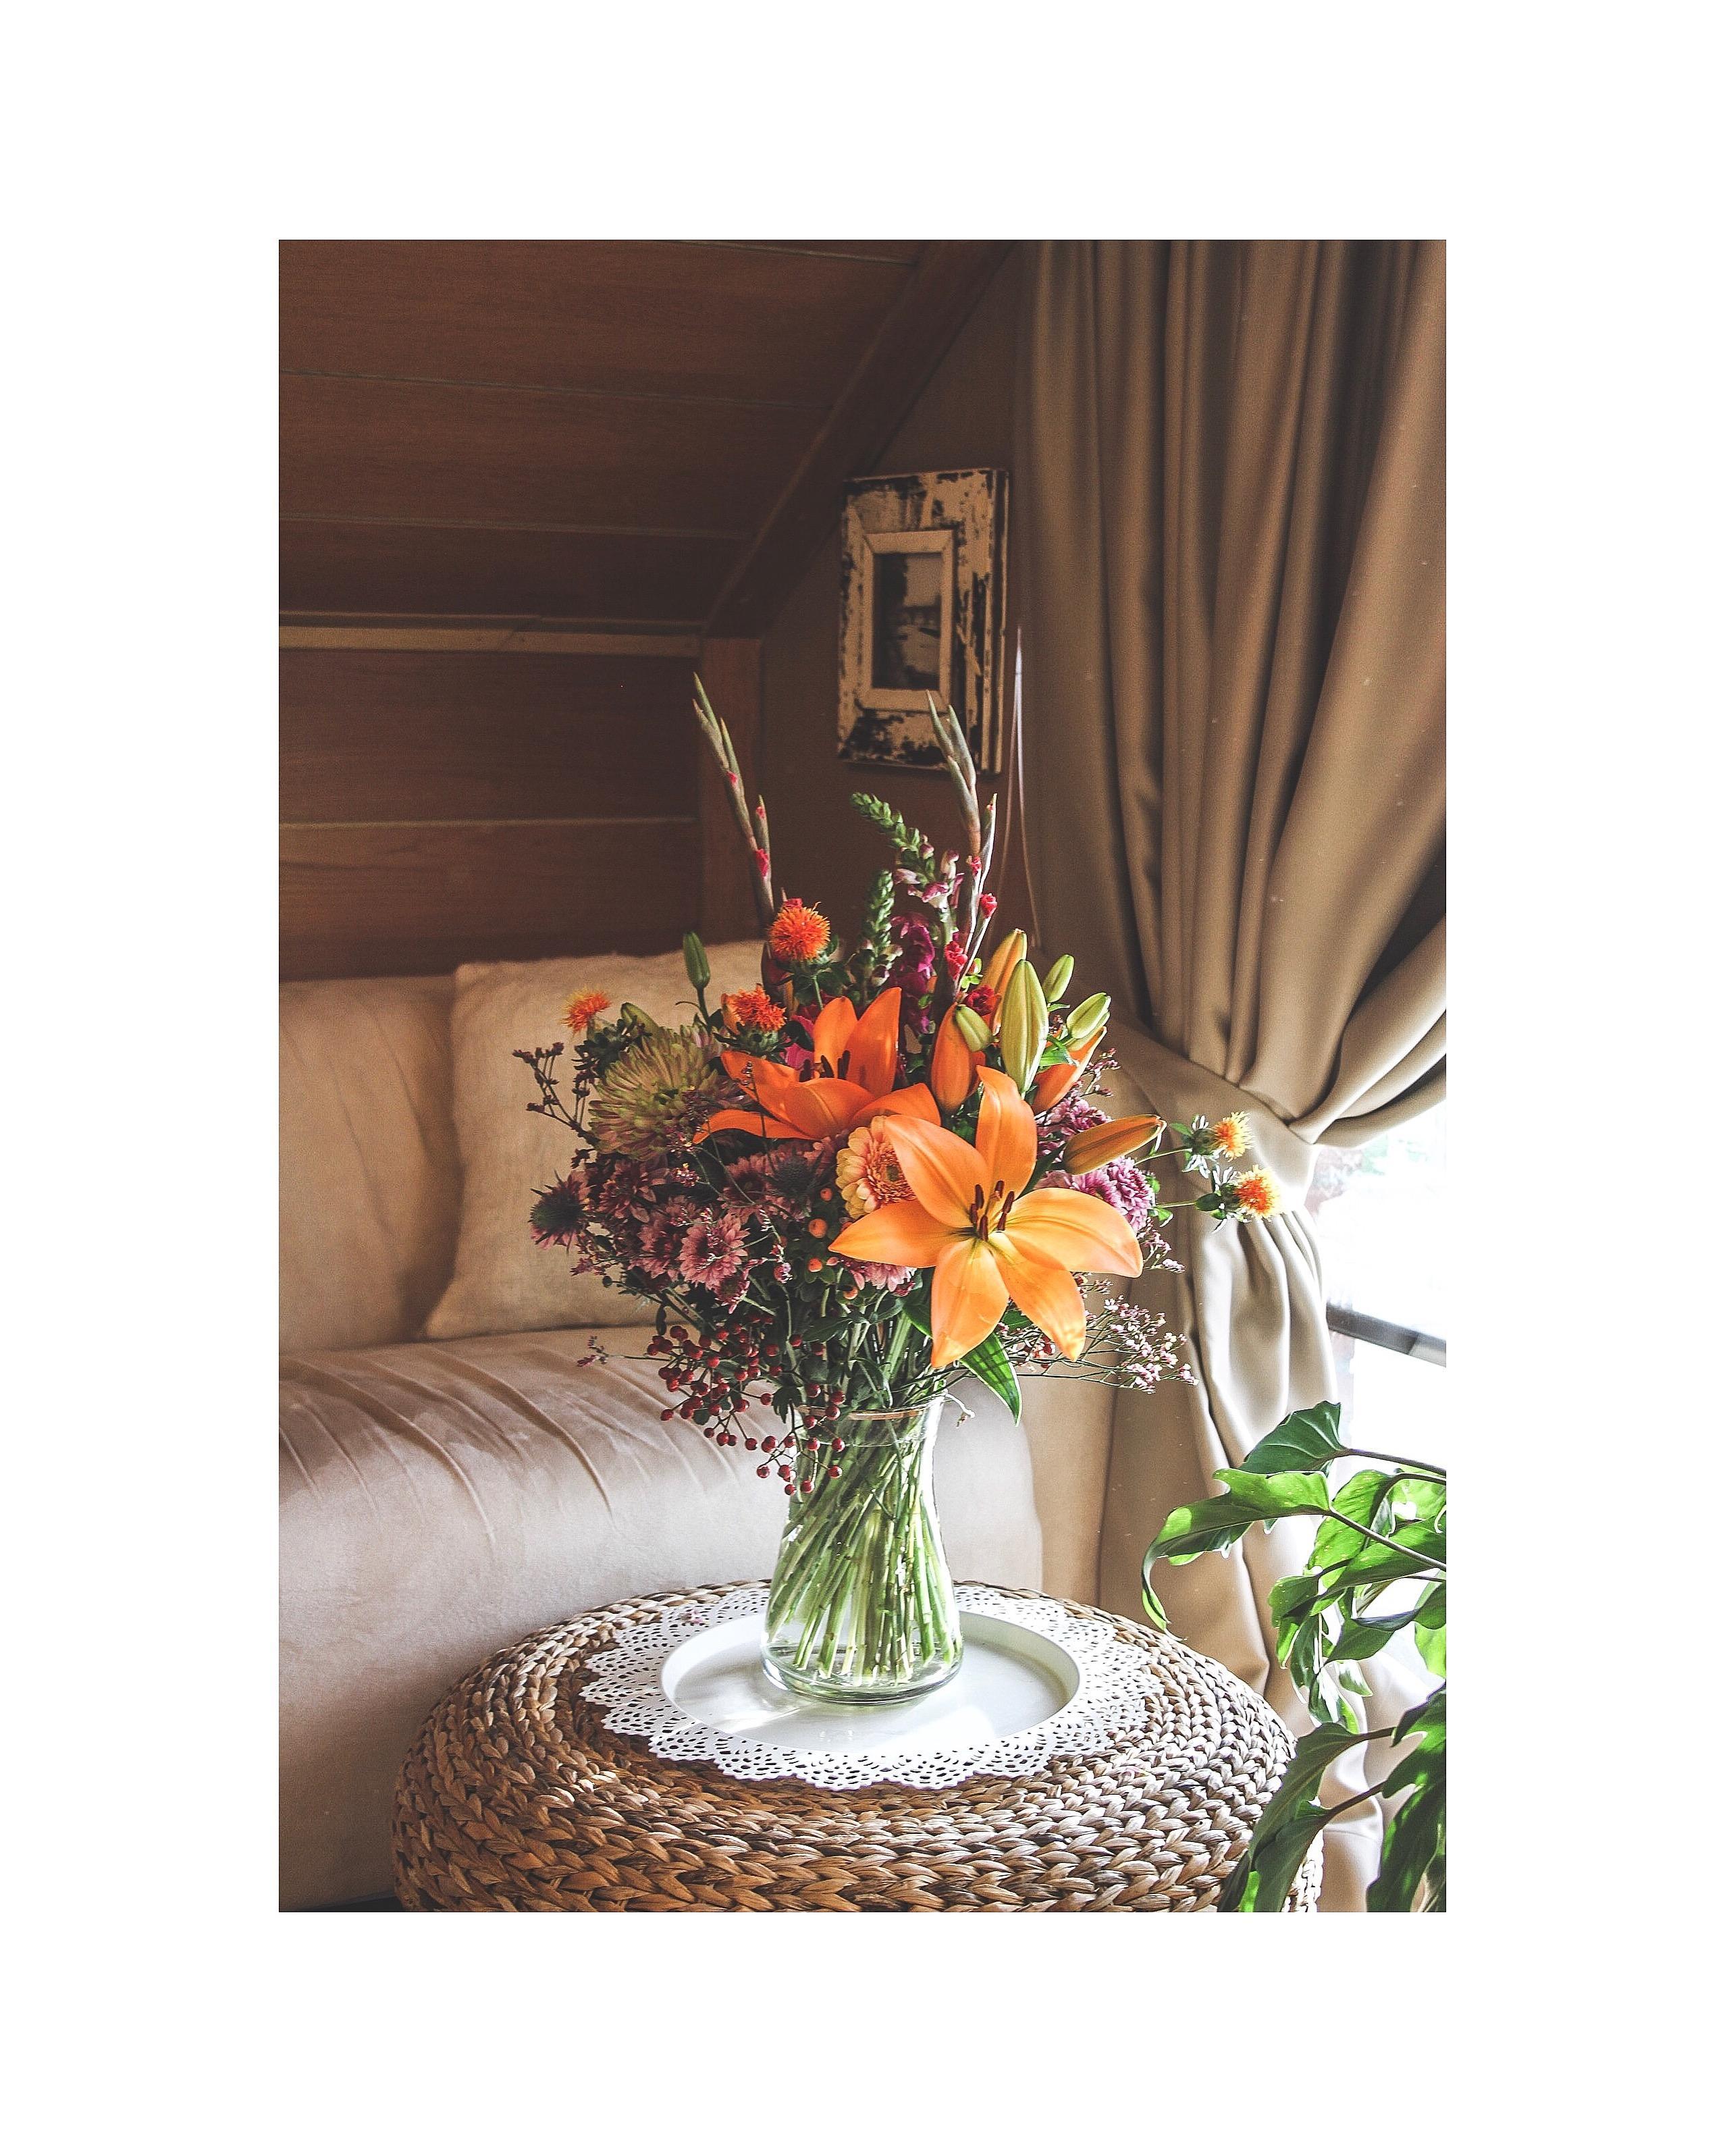 stunning holz deko selber machen images - amazing home ideas ... - Holz Deko Selber Machen